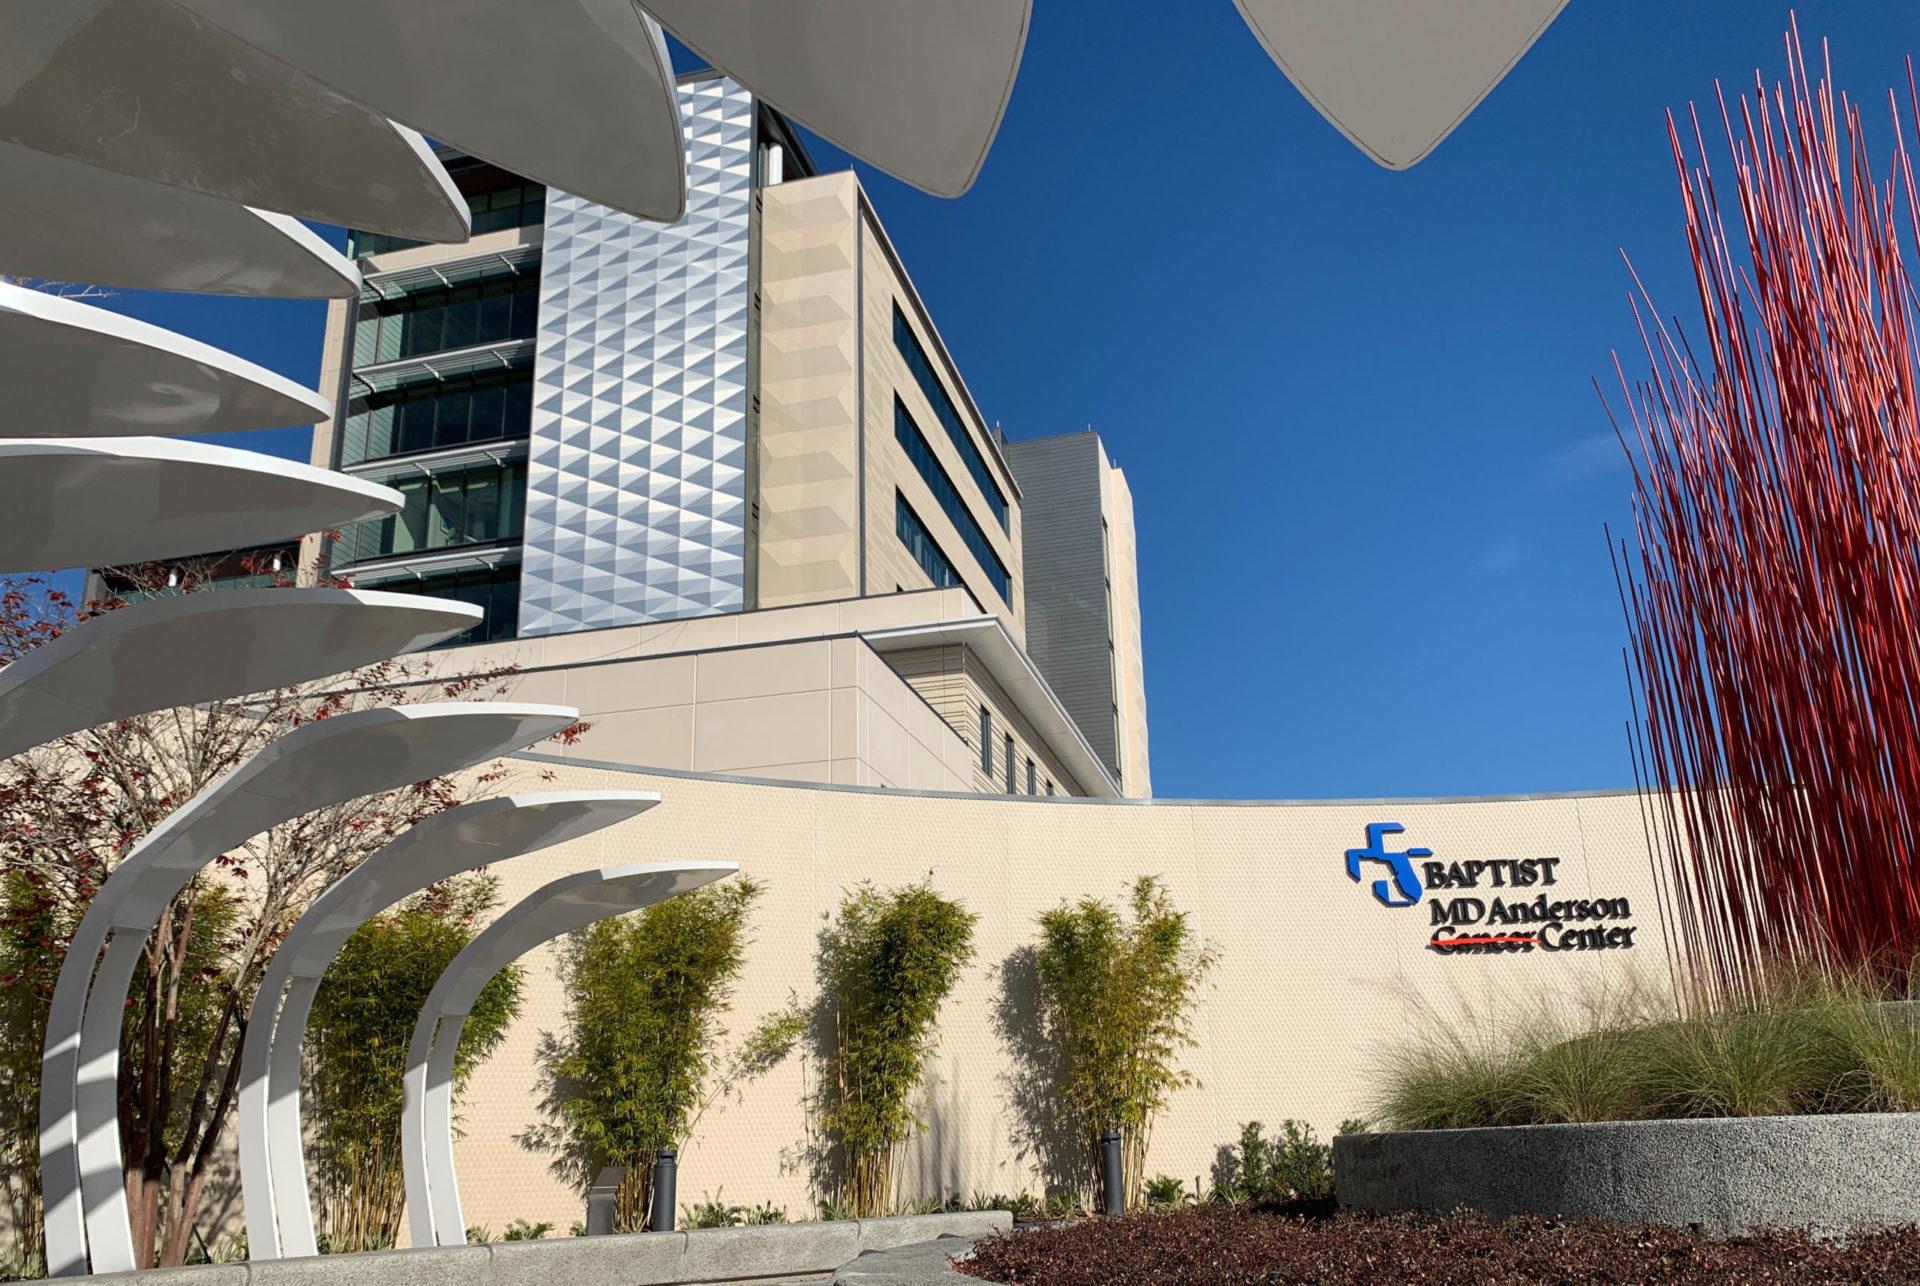 Baptist MD Anderson Cancer Center